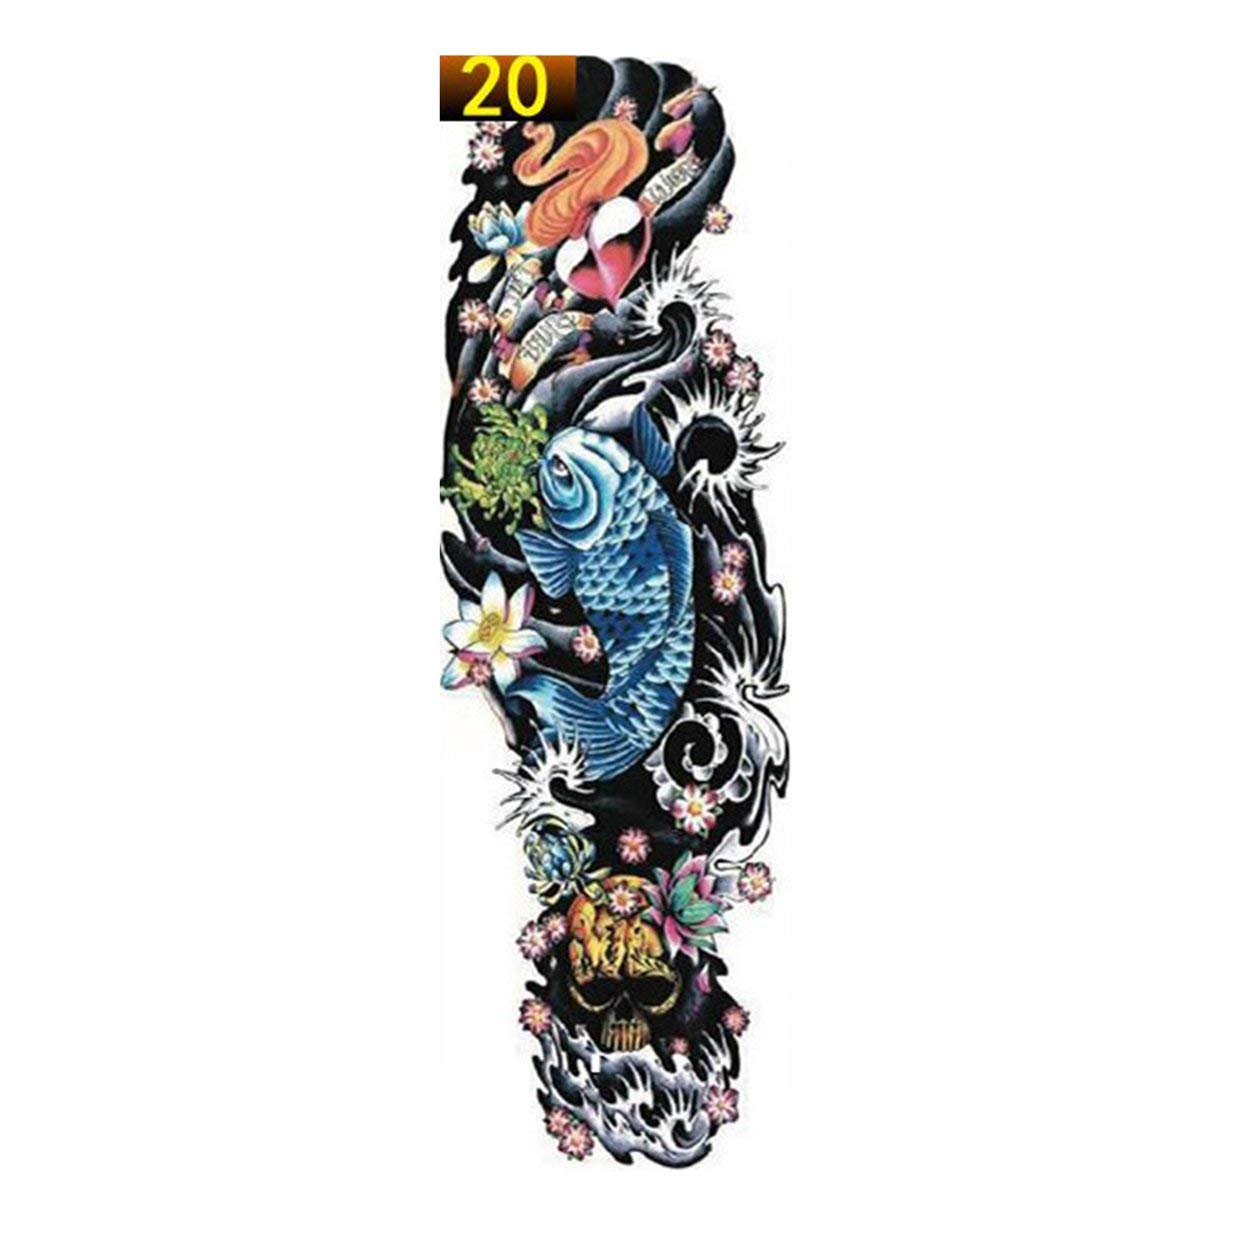 banbie8409 1 UNIDS Brazo Completo Etiqueta Engomada del Tatuaje de la Flor Impermeable Tatuaje Temporal Manga Hombres Mujeres Pintura Corporal Transferencia de Agua Fake Tatoo Manga